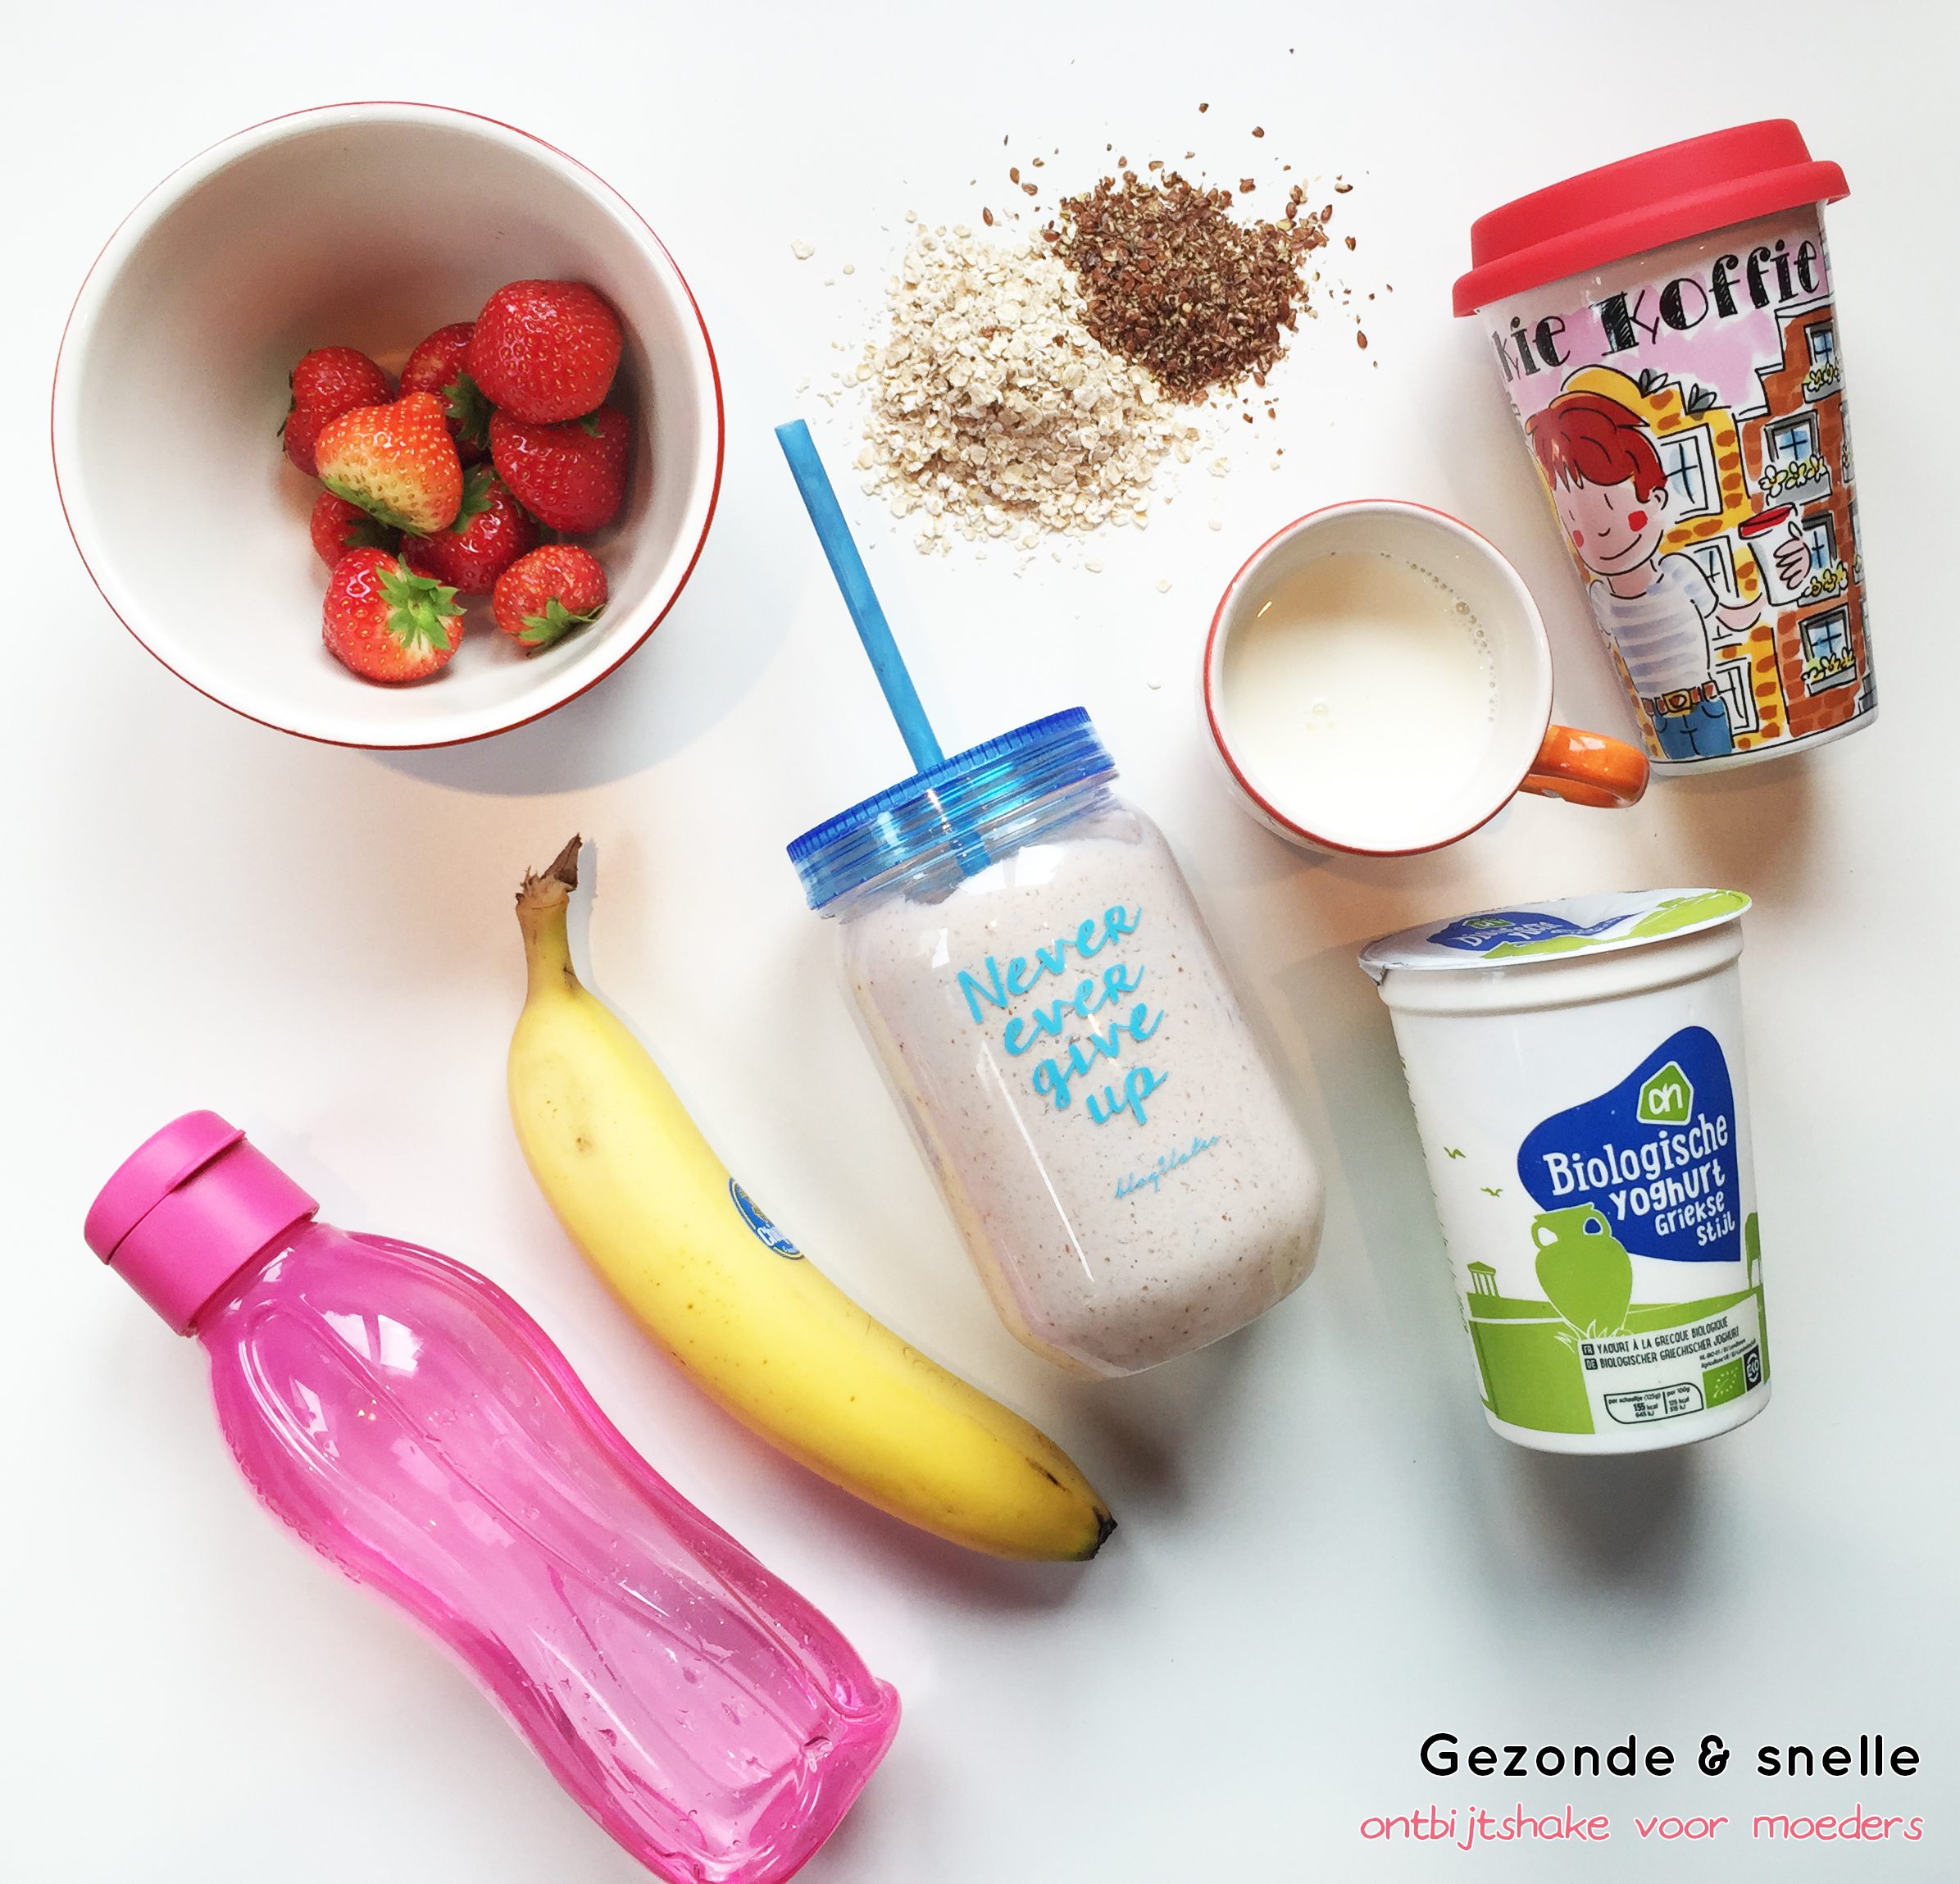 Snelle en gezonde ontbijtshake